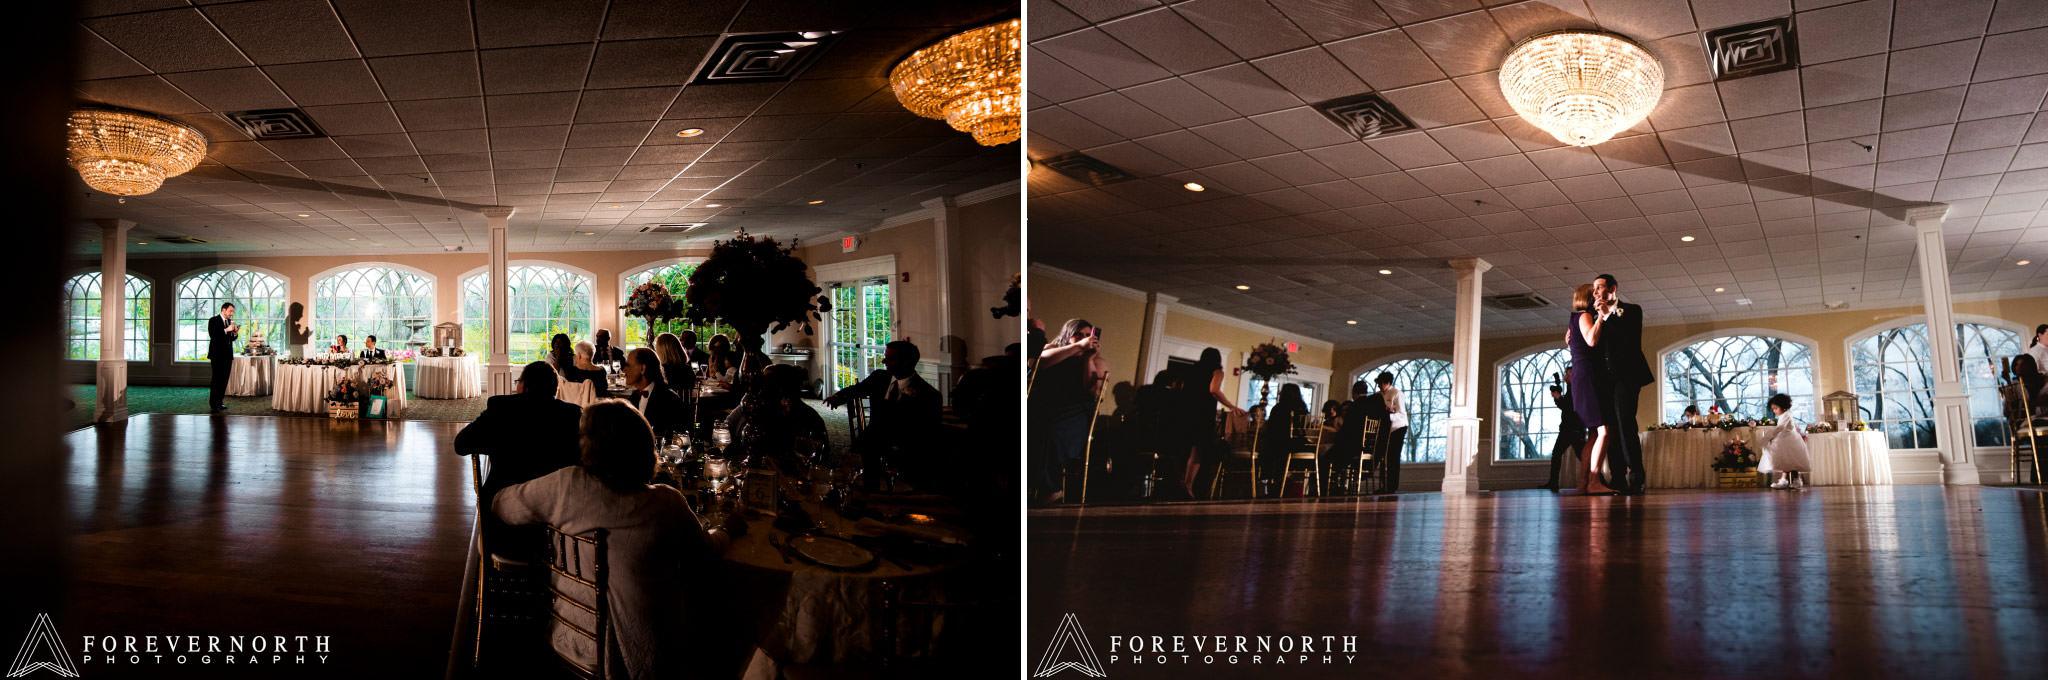 Rivera-Bradford-Estate-Wedding-Photographer-03.JPG